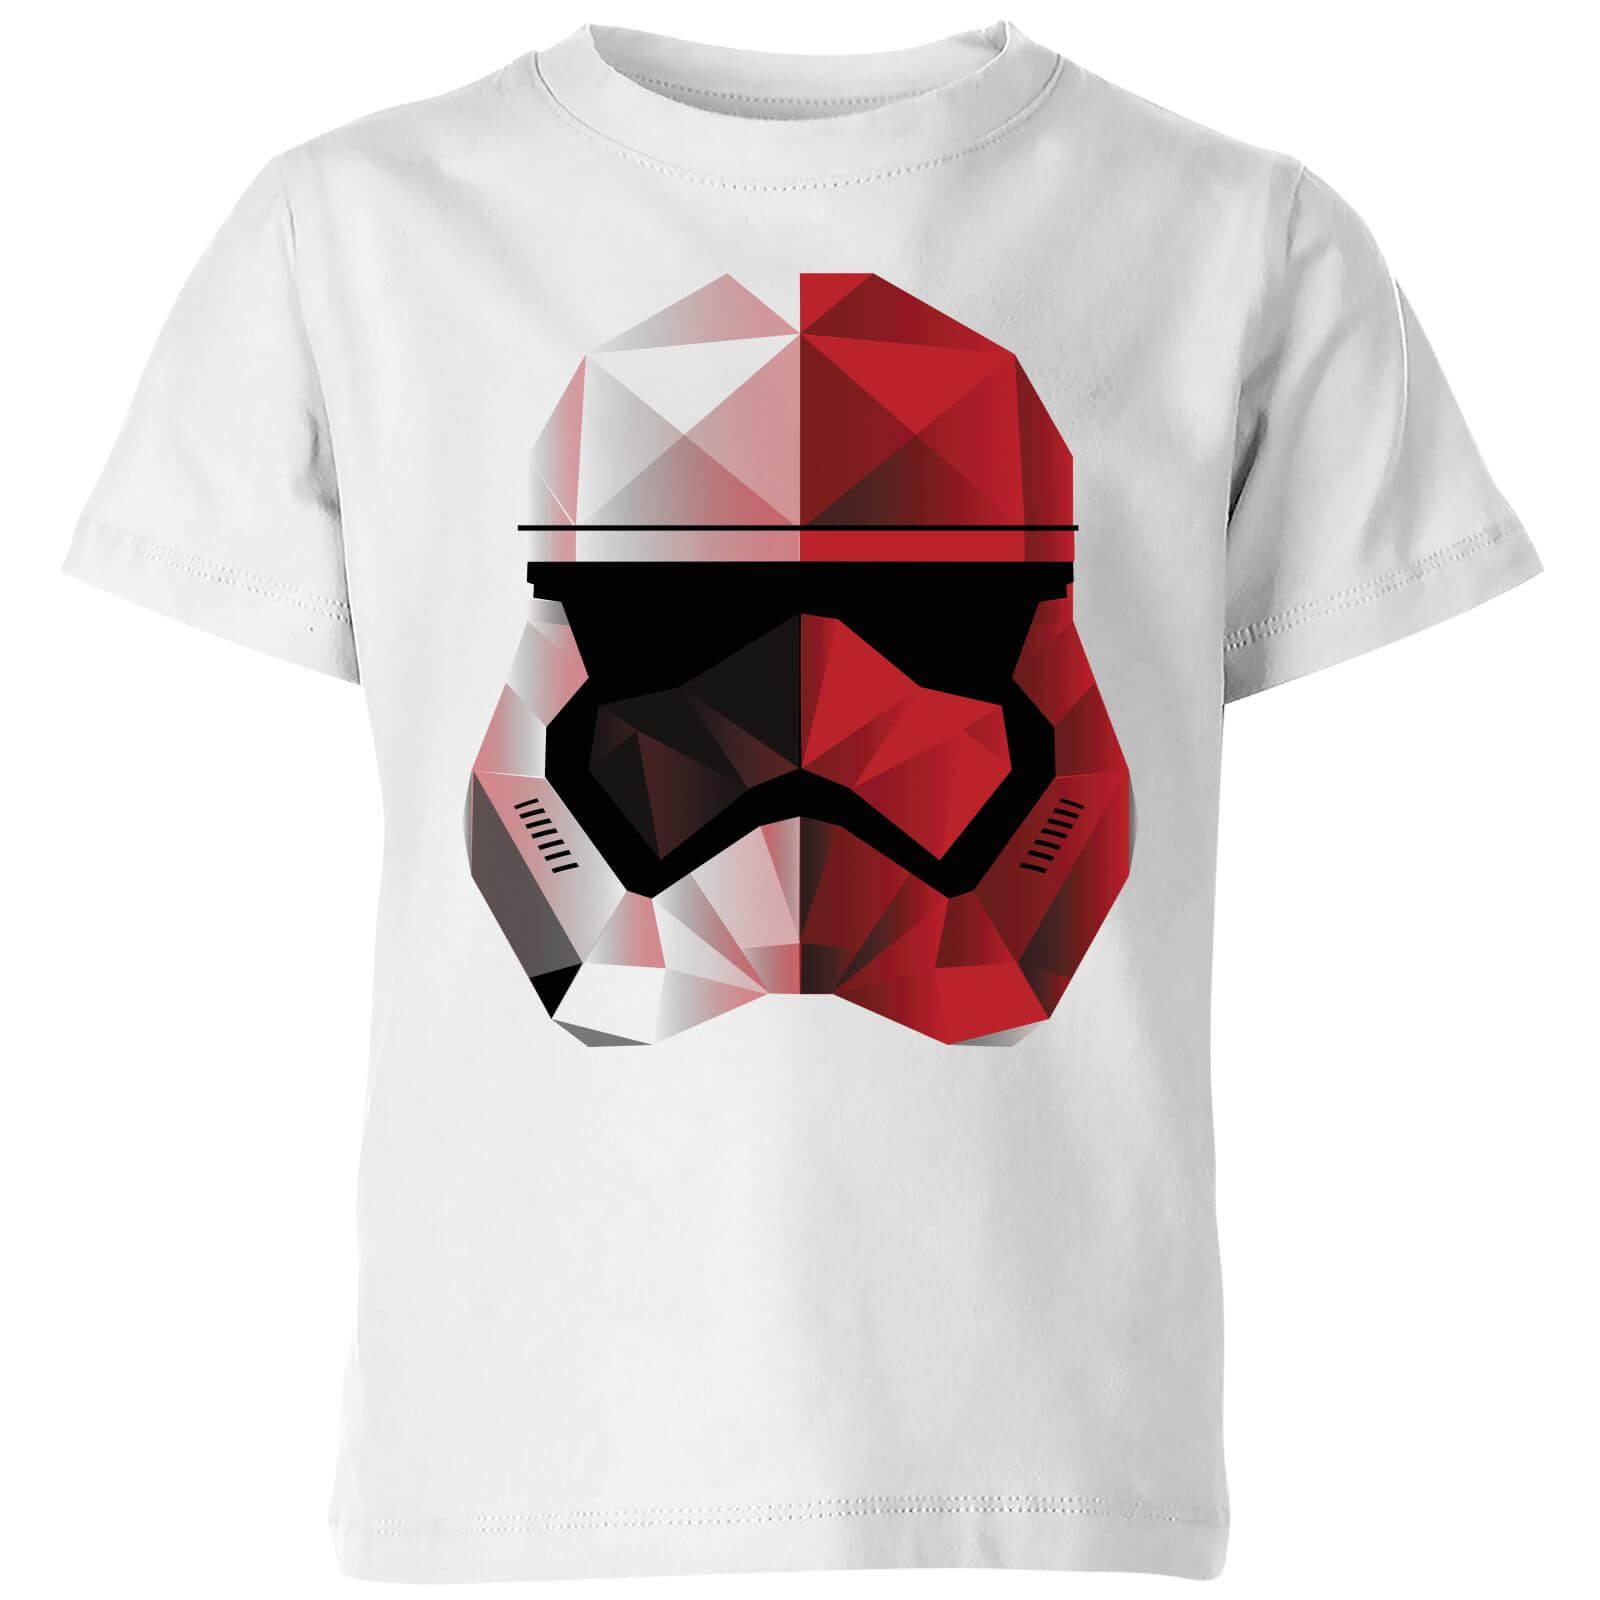 Star Wars T-Shirt Enfant Casque Stormtrooper Effet Cubiste - Star Wars - Blanc - 11-12 ans - Blanc